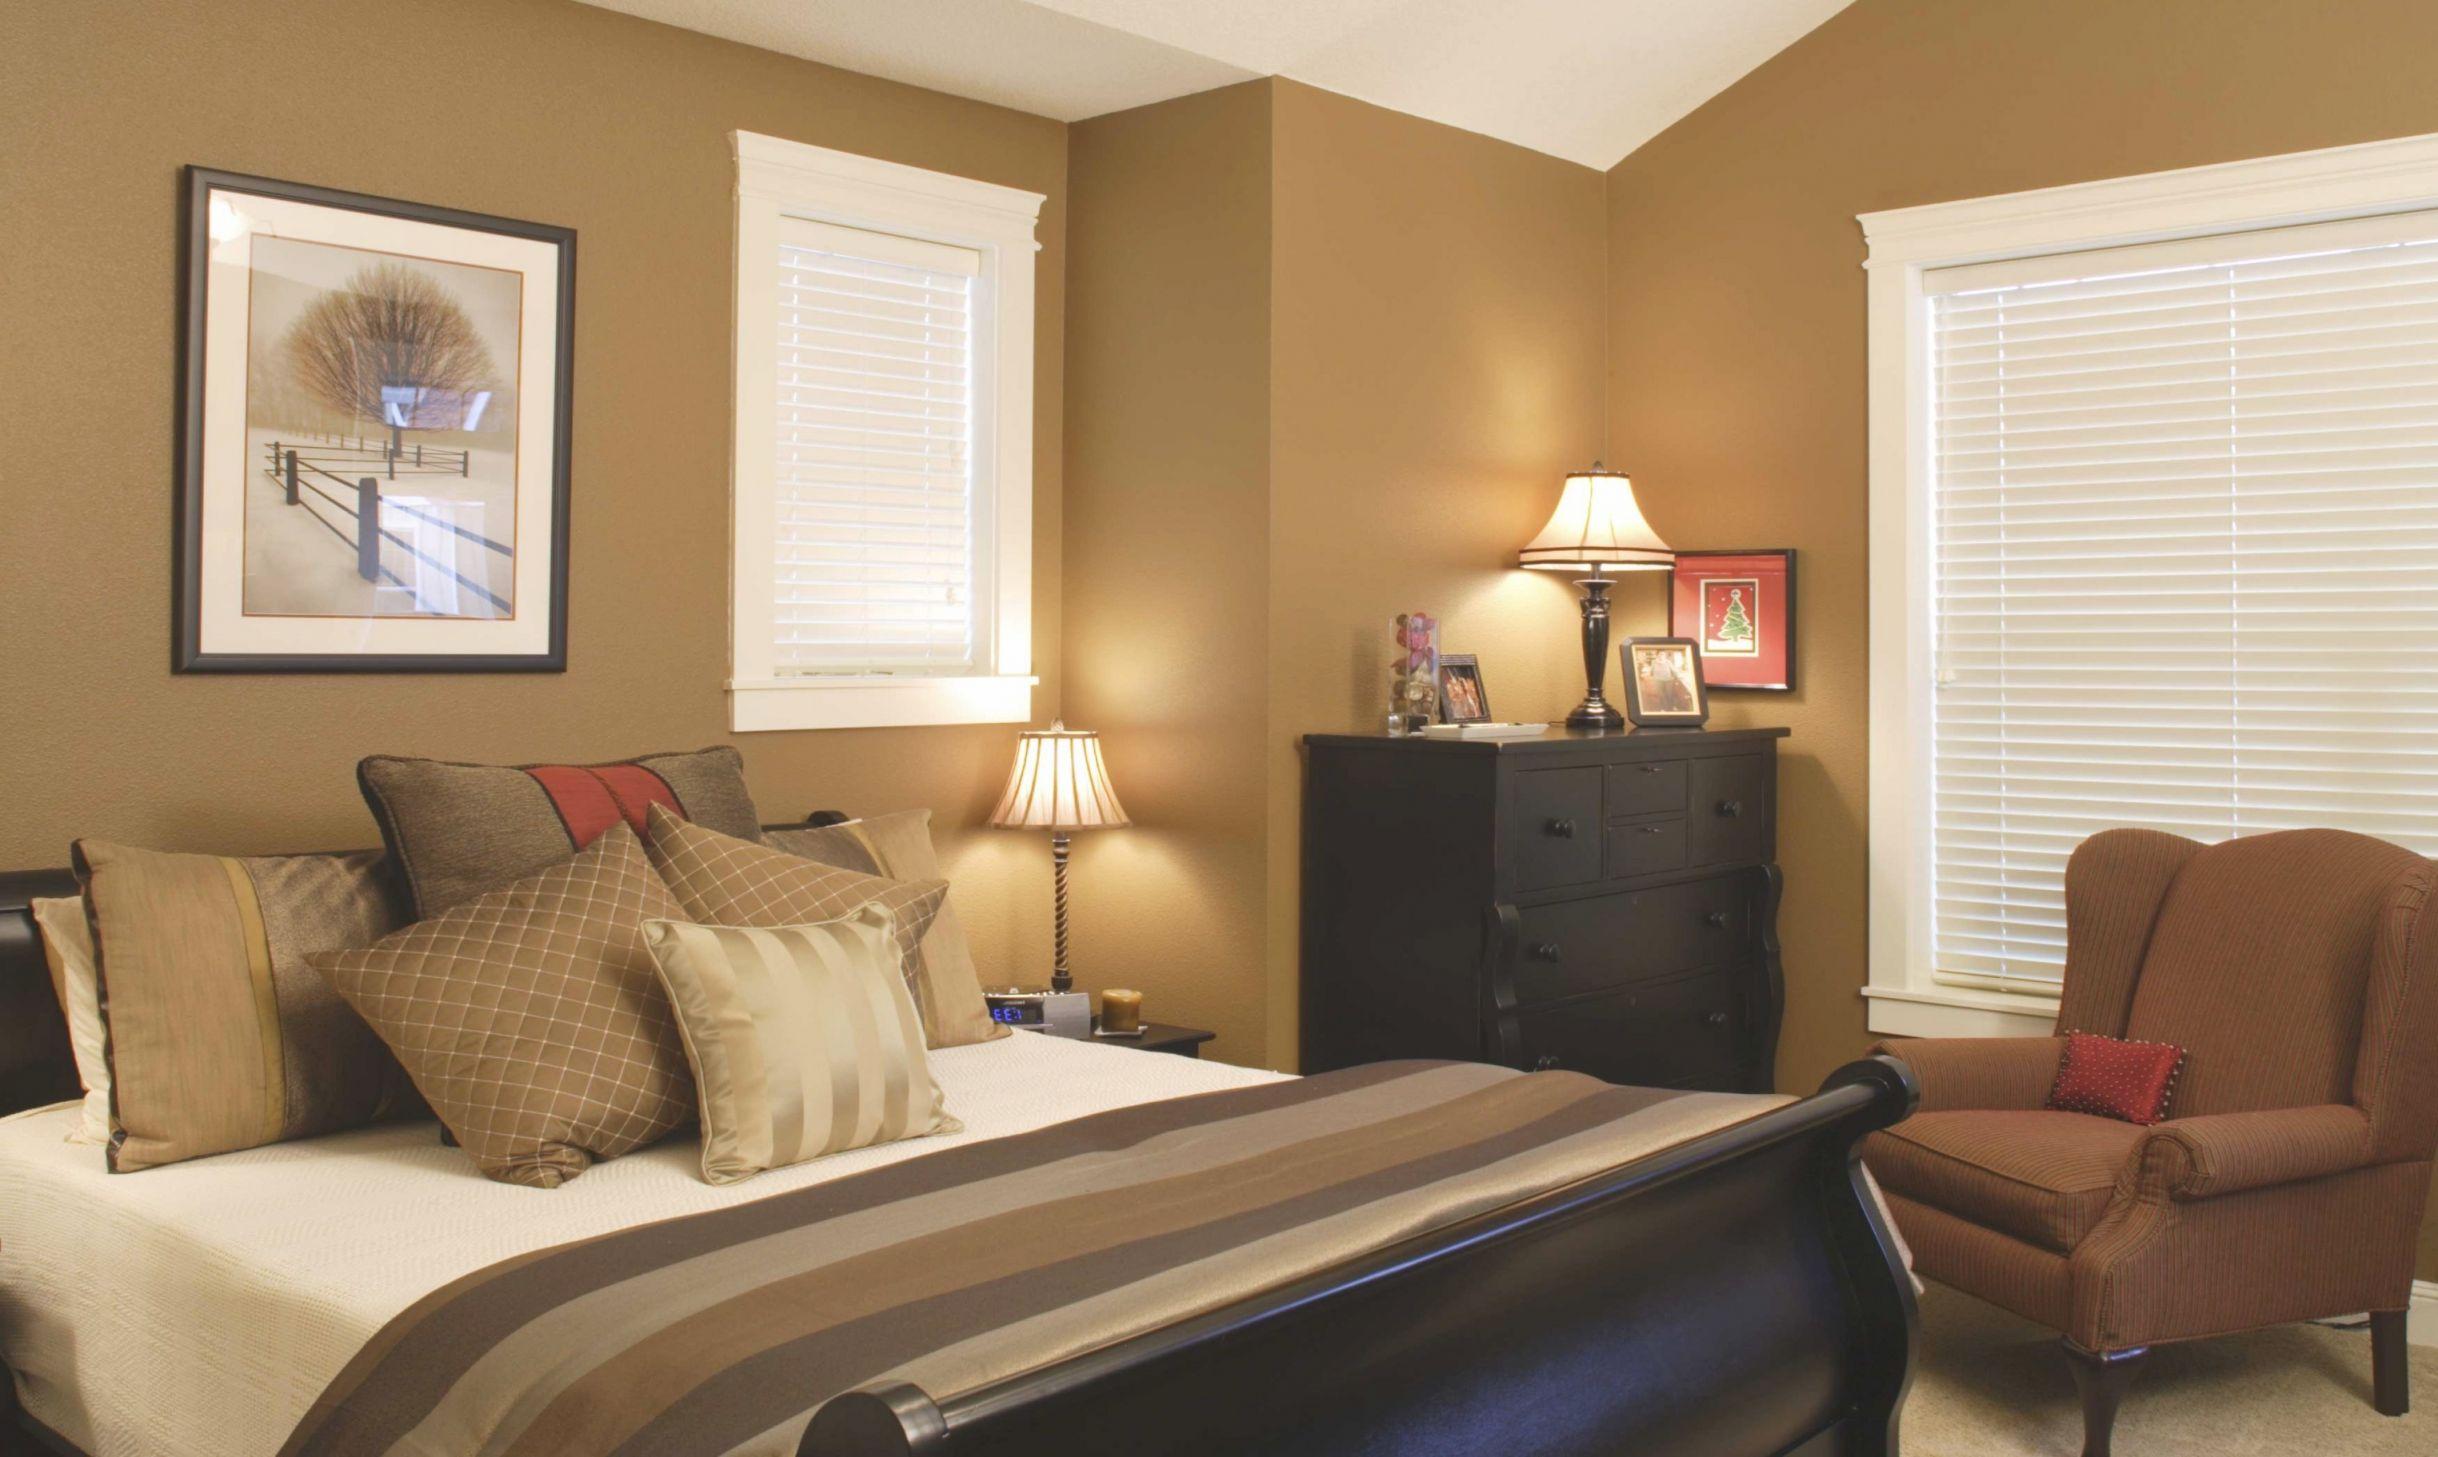 Bedroom Wall Decor 30 Inspirational Master Bedroom Wall throughout Master Bedroom Wall Decor Ideas